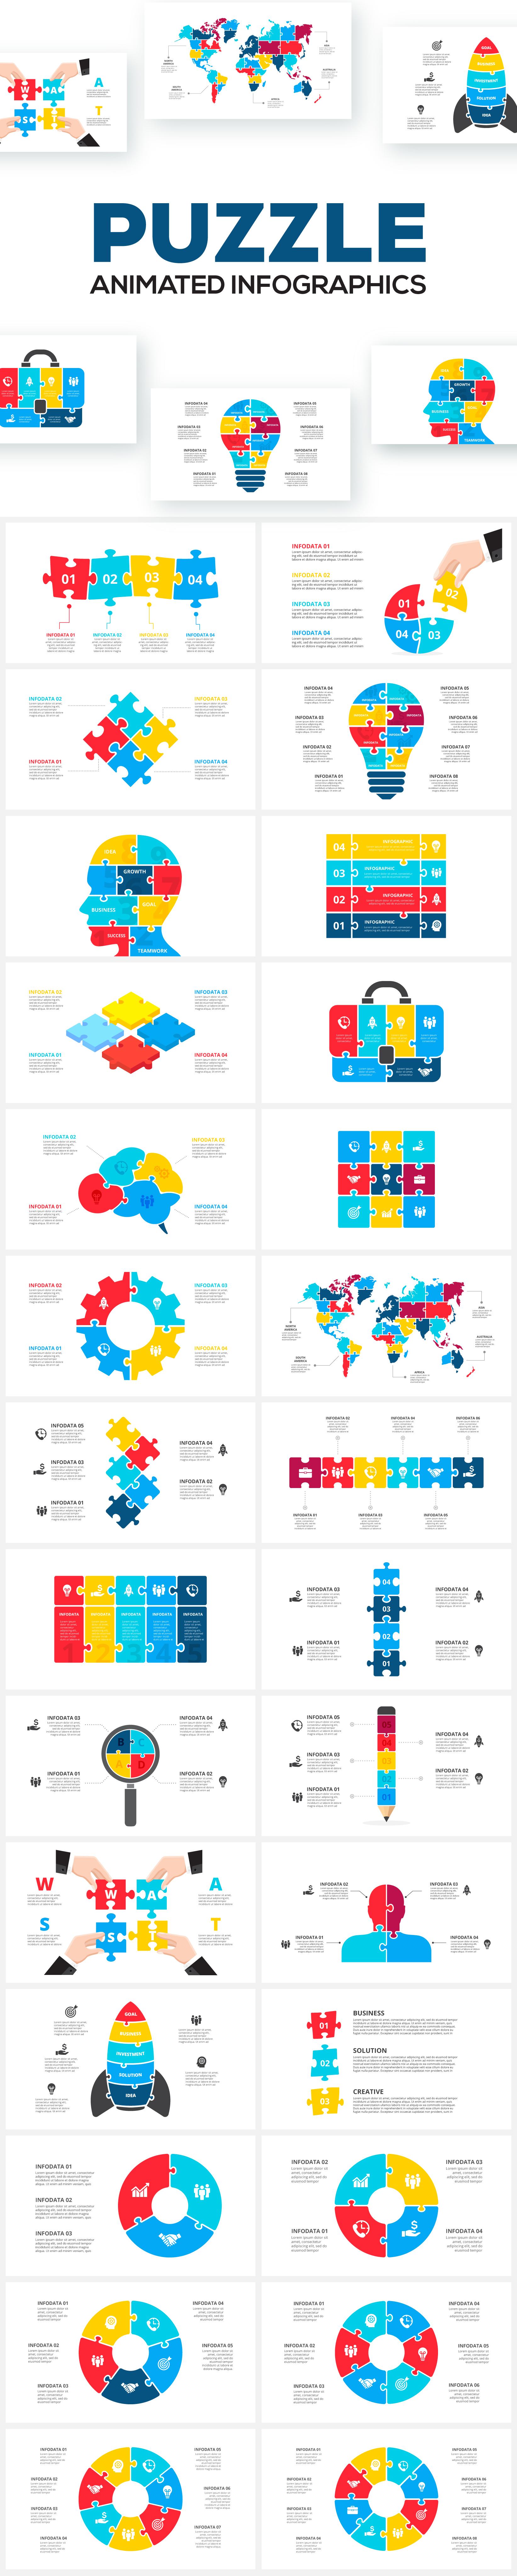 Multipurpose Infographics PowerPoint Templates v.5.0 - 129